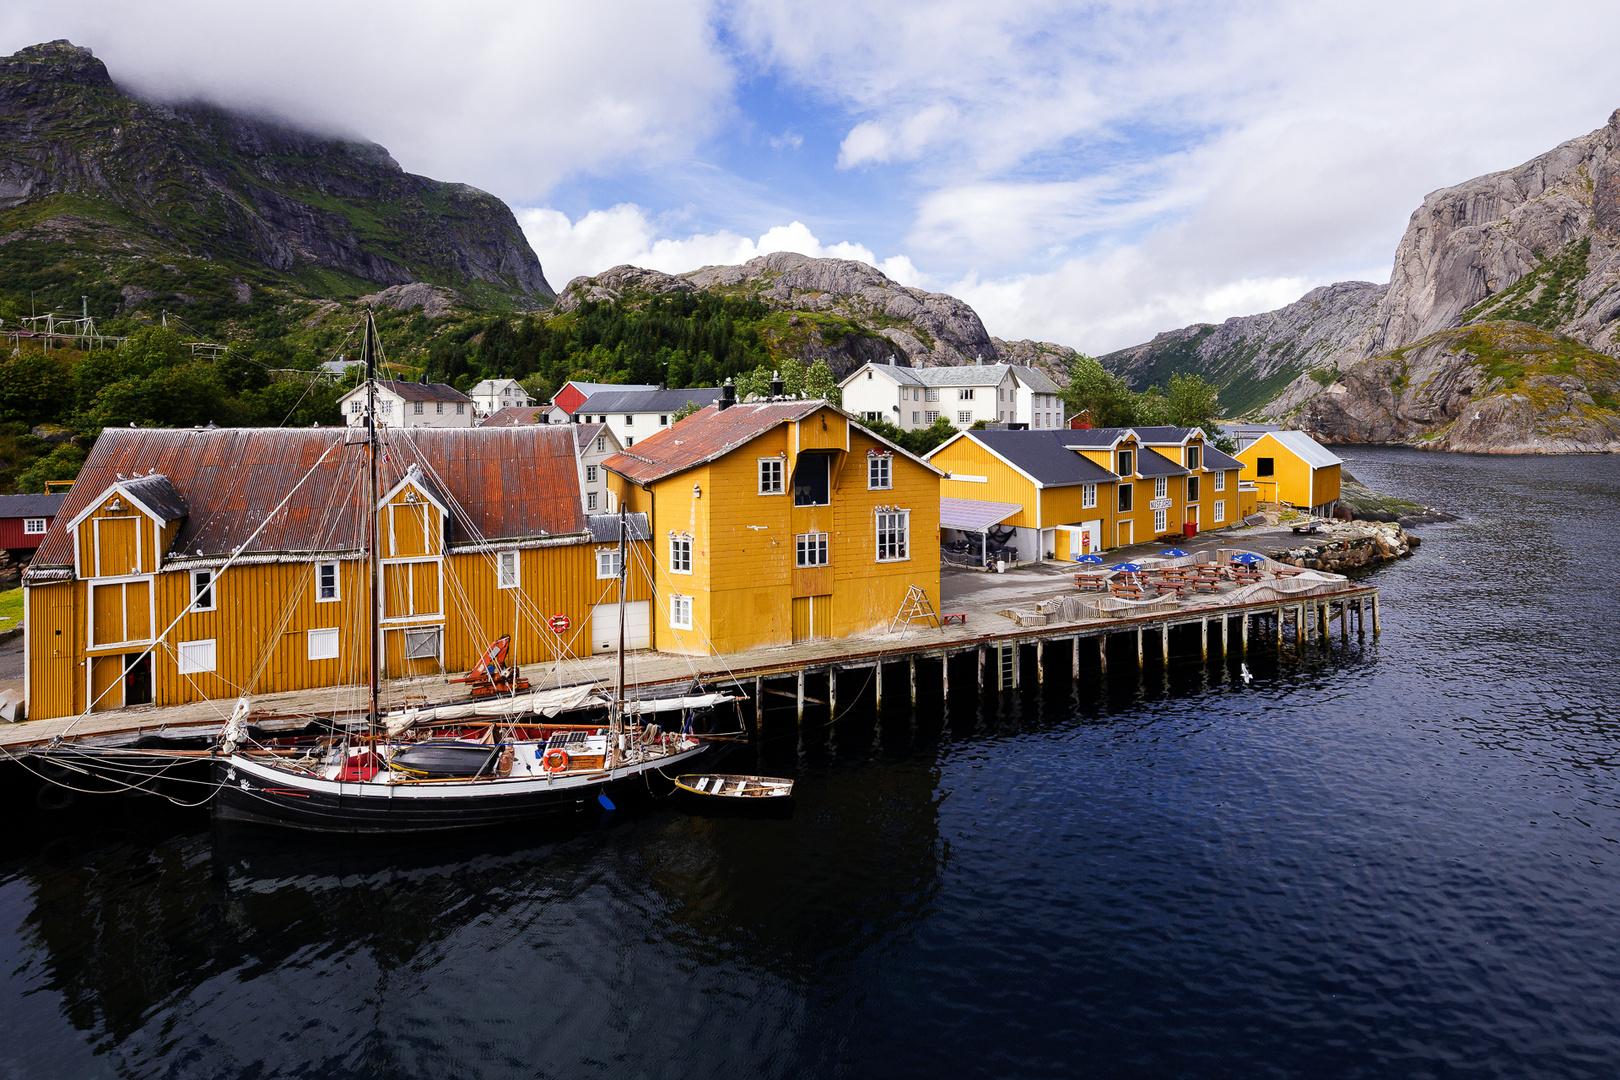 Nusfjord, Flakstadøy